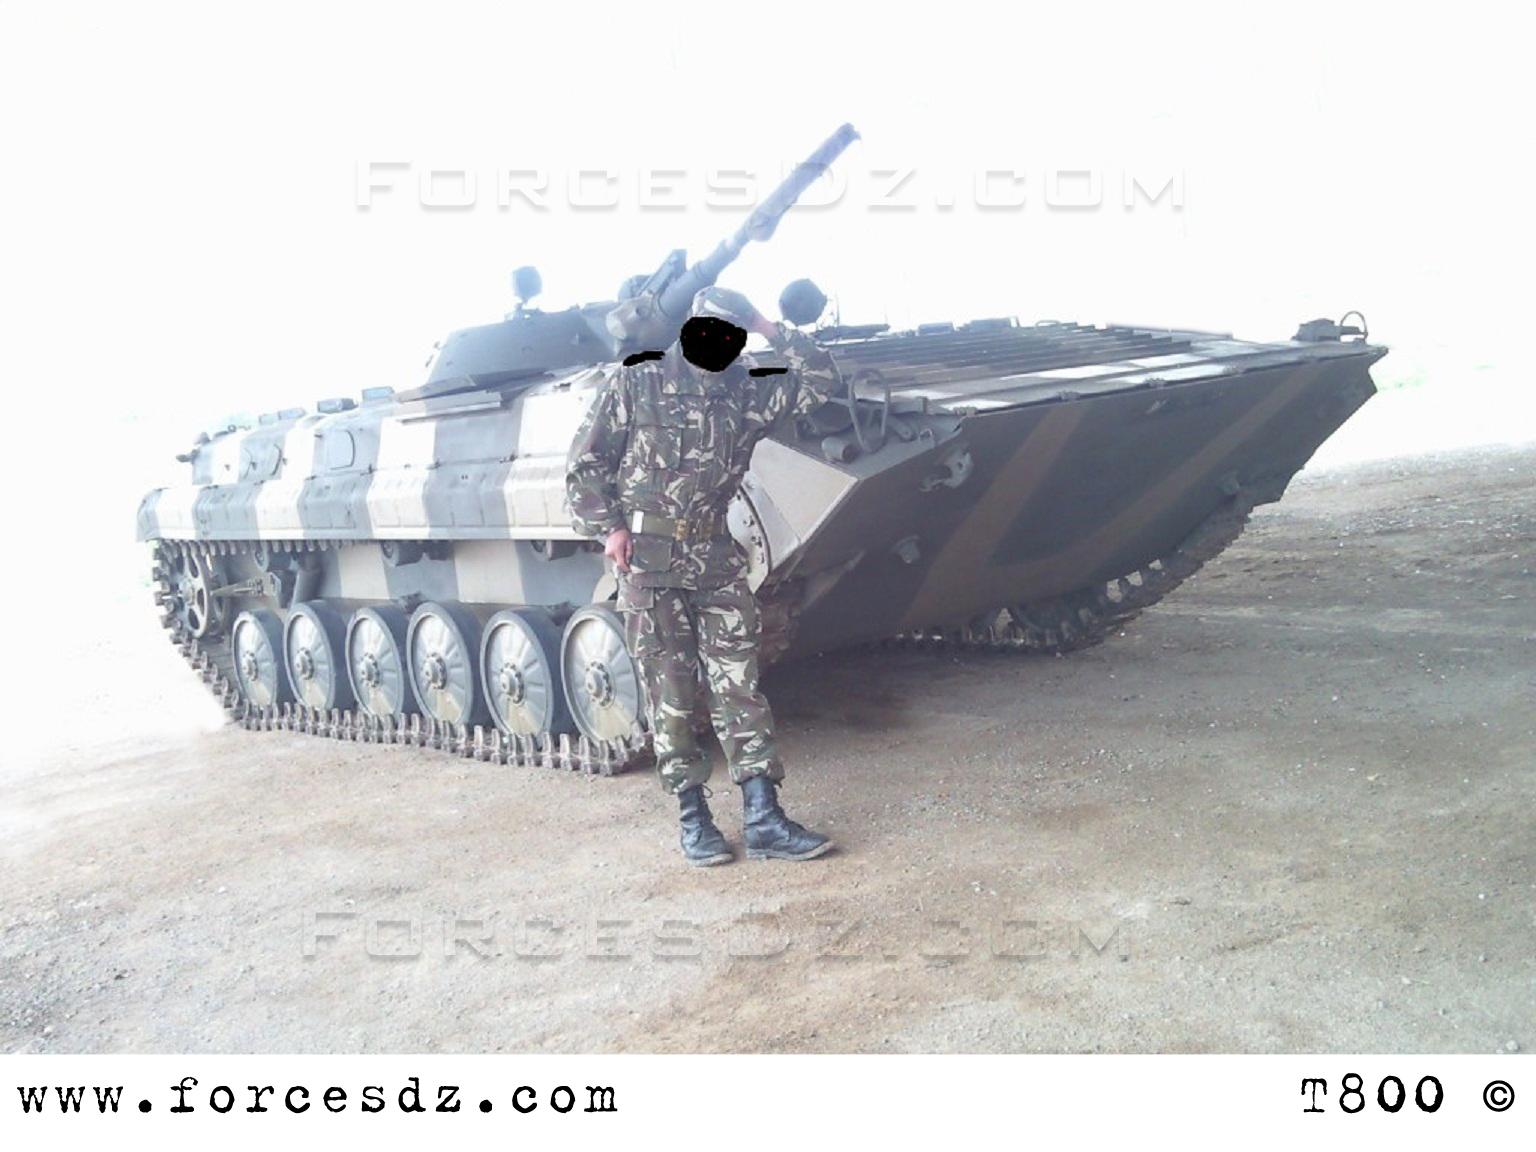 Fuerzas Armadas de Argelia BMP-1